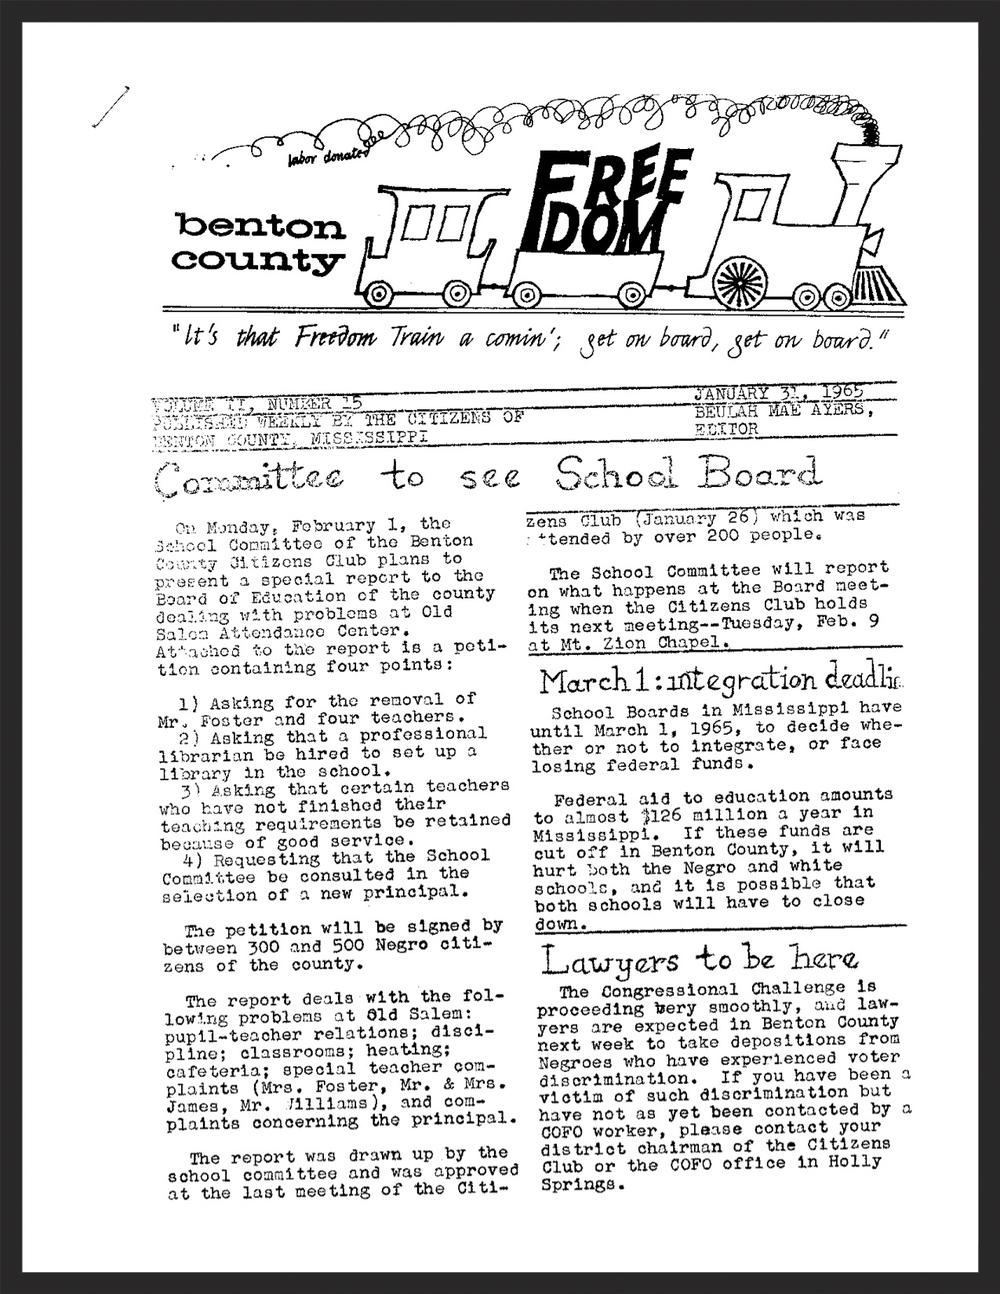 January 31, 1965